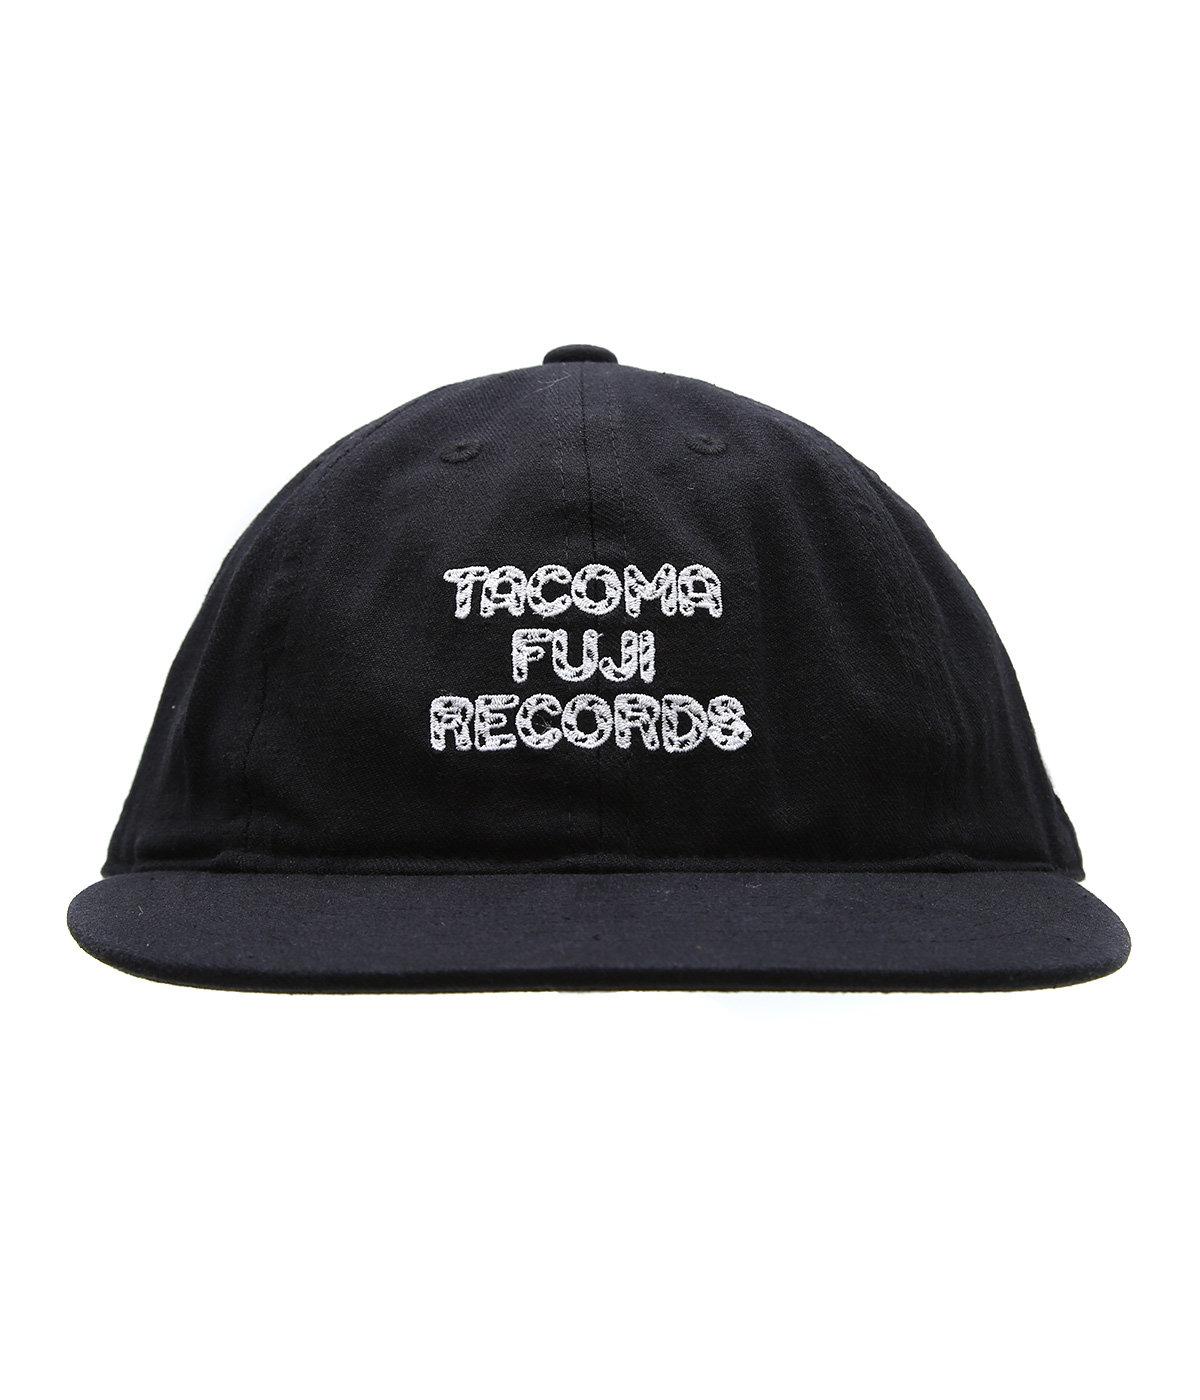 TACOMA FUJI ZEBRA LOGO CAP